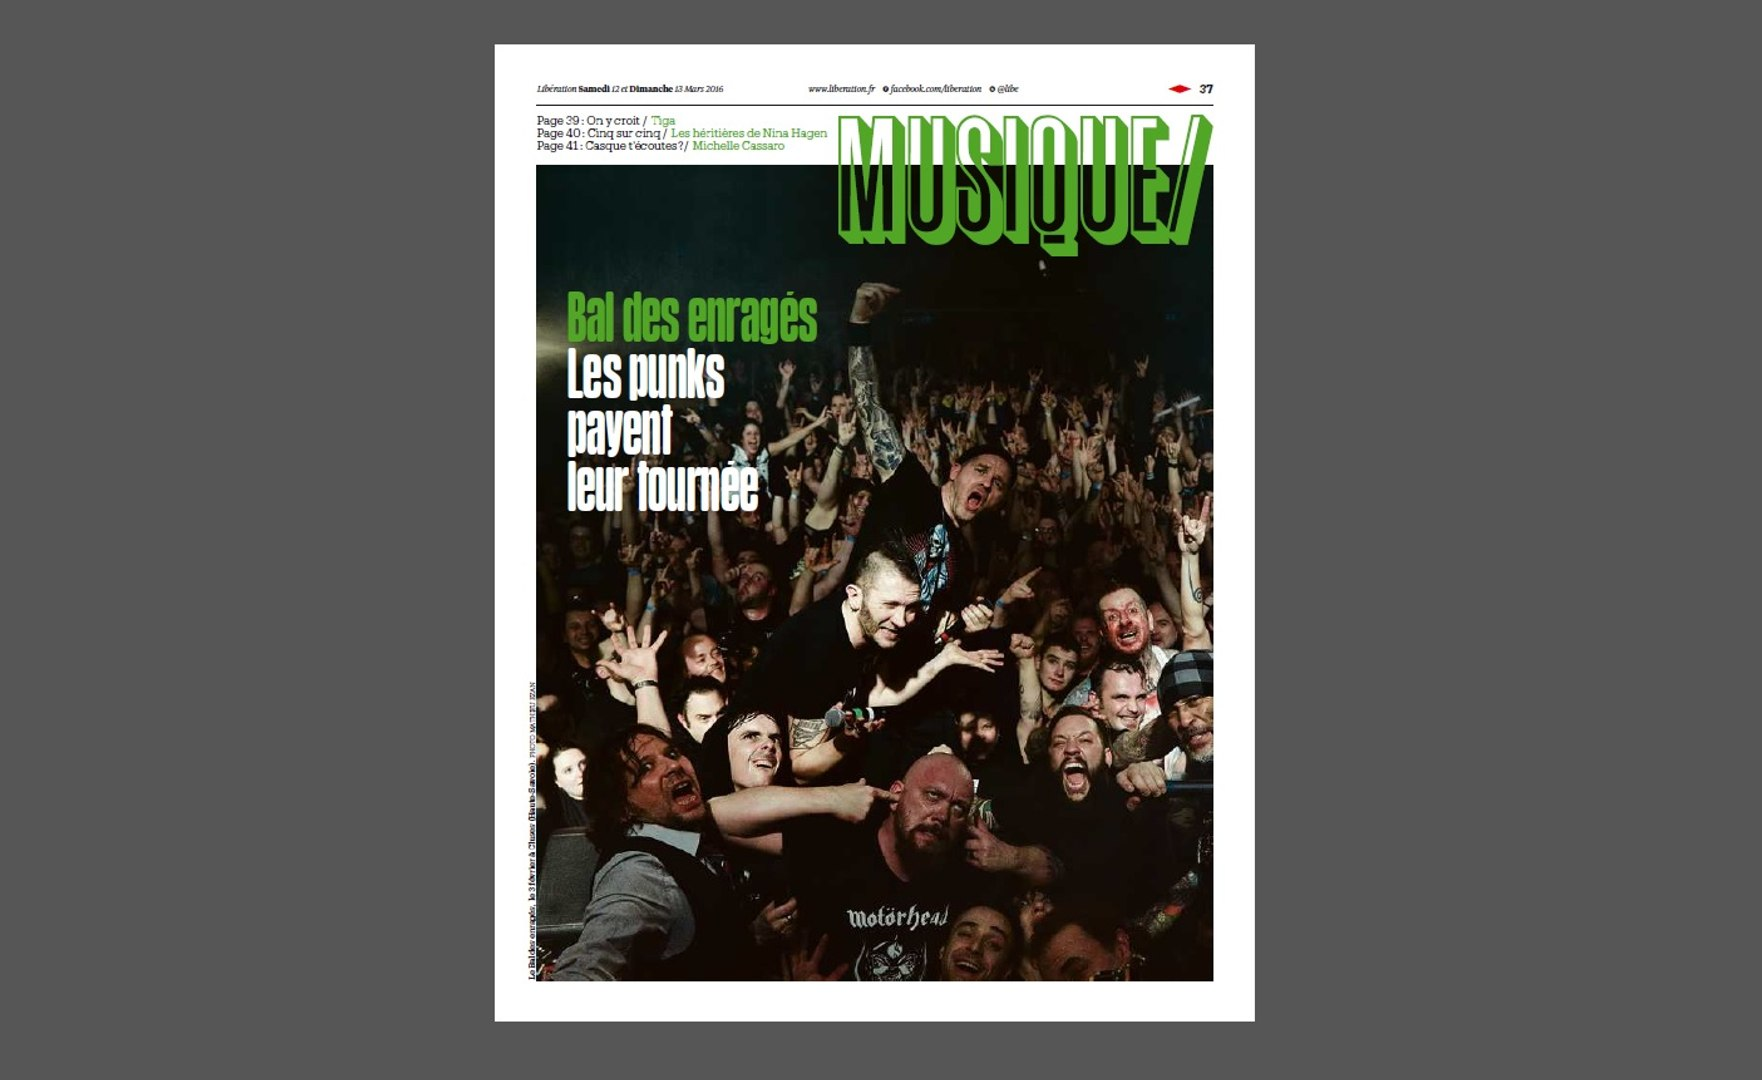 Jeff Buckley, Alex Gopher, Damien Jurado : la playlist du cahier musique de Libé du 12 mars 2016